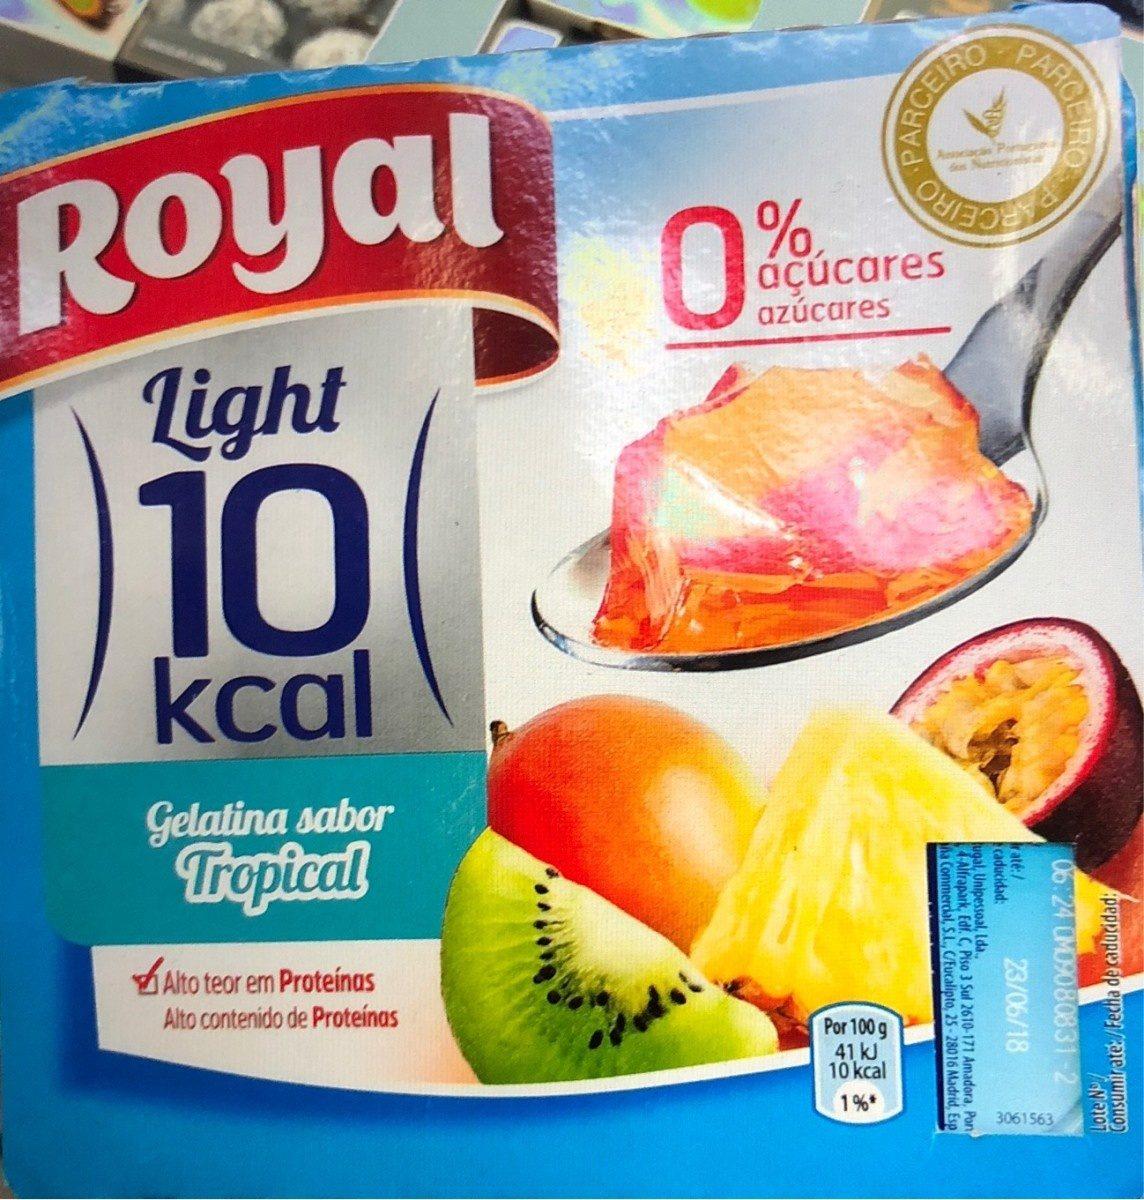 Gelatina sabor tropical - Product - es